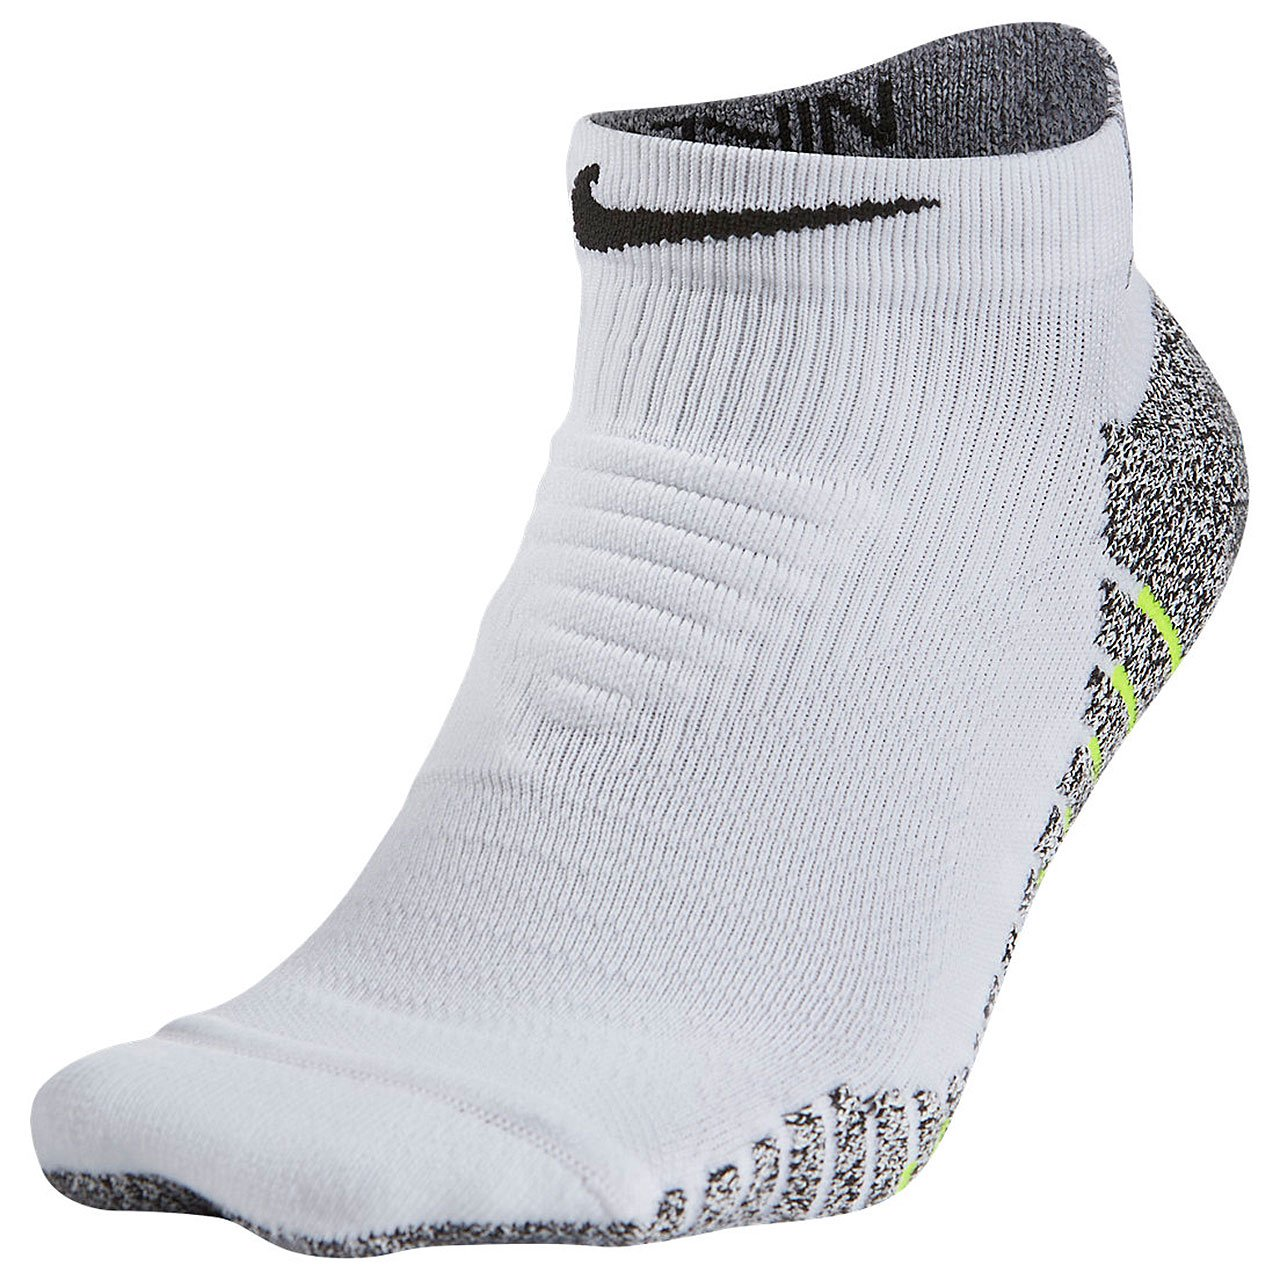 White,Black SX5751-100 Fits Men 6-8, Wmn 6-10 Nike Mens Grip Lightweight Low Training Socks Medium